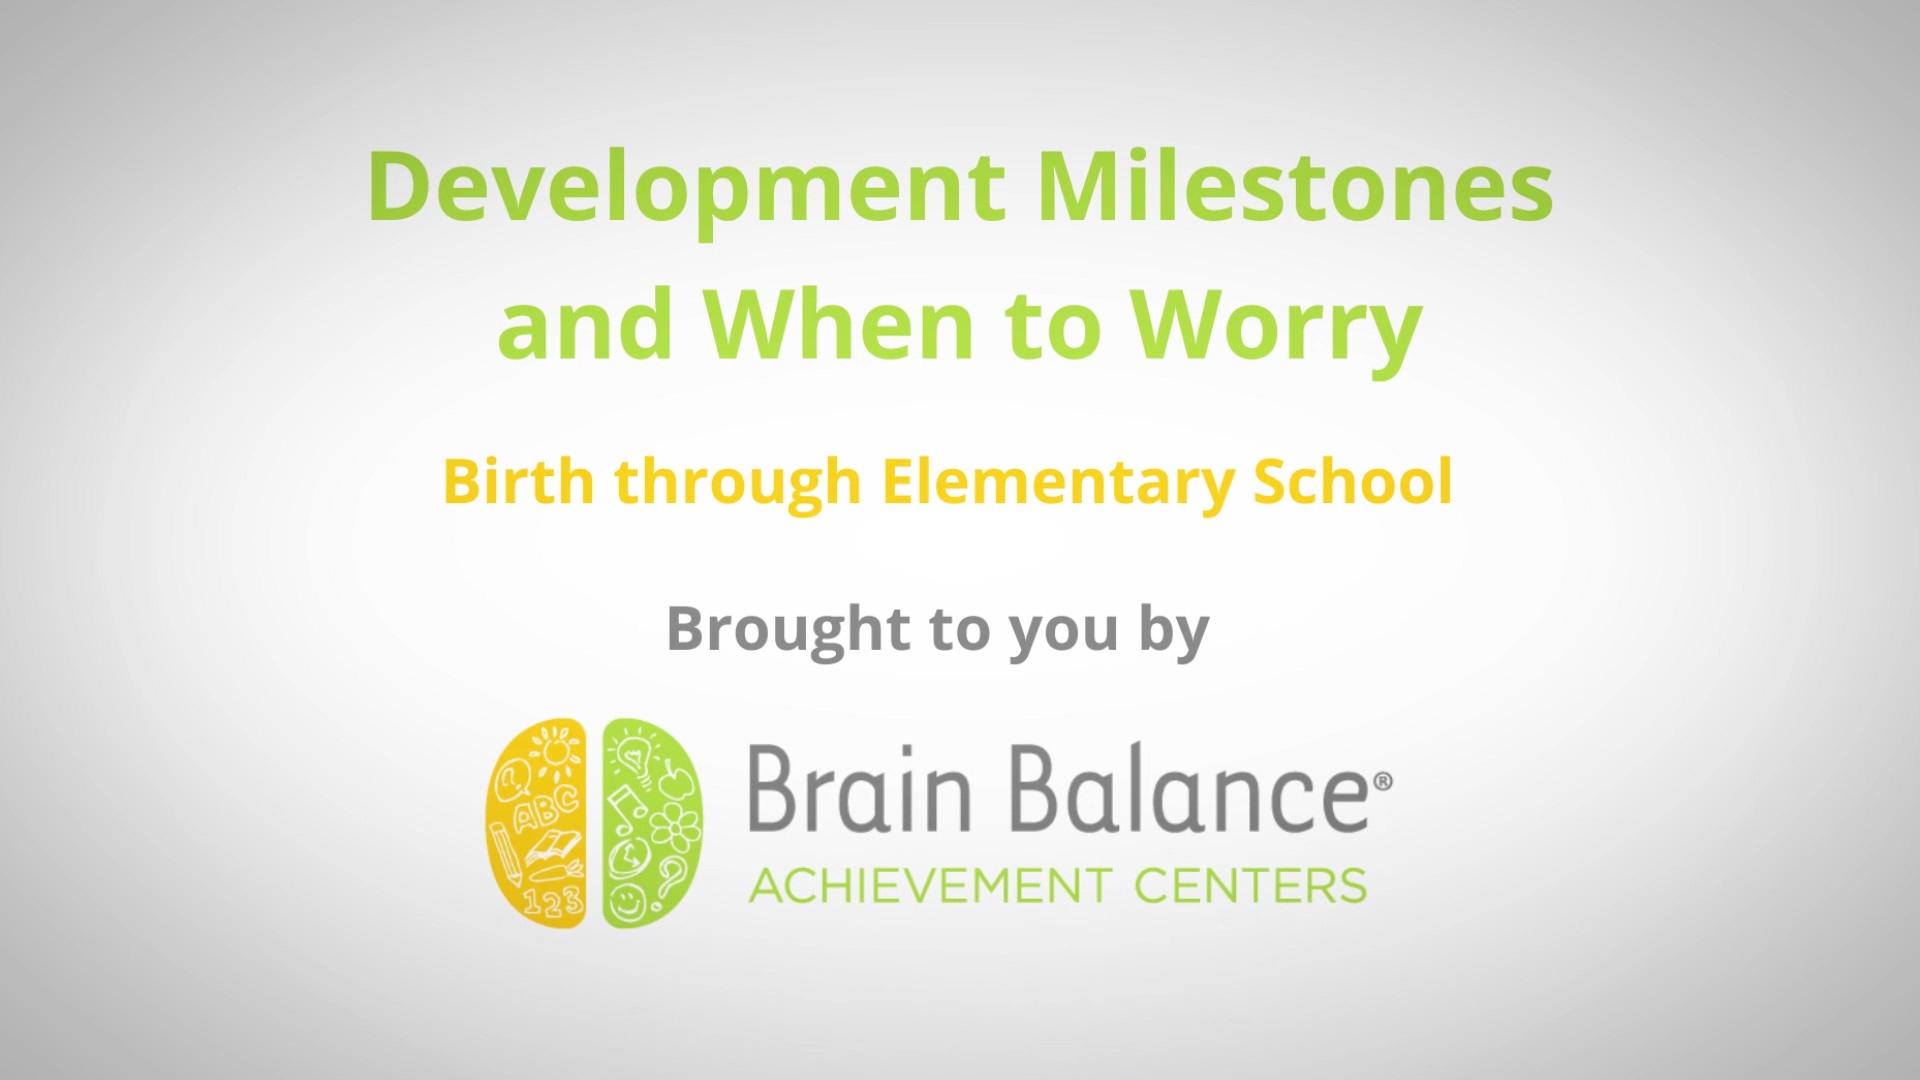 Development Milestones Birth Through Elementary (July 2019)